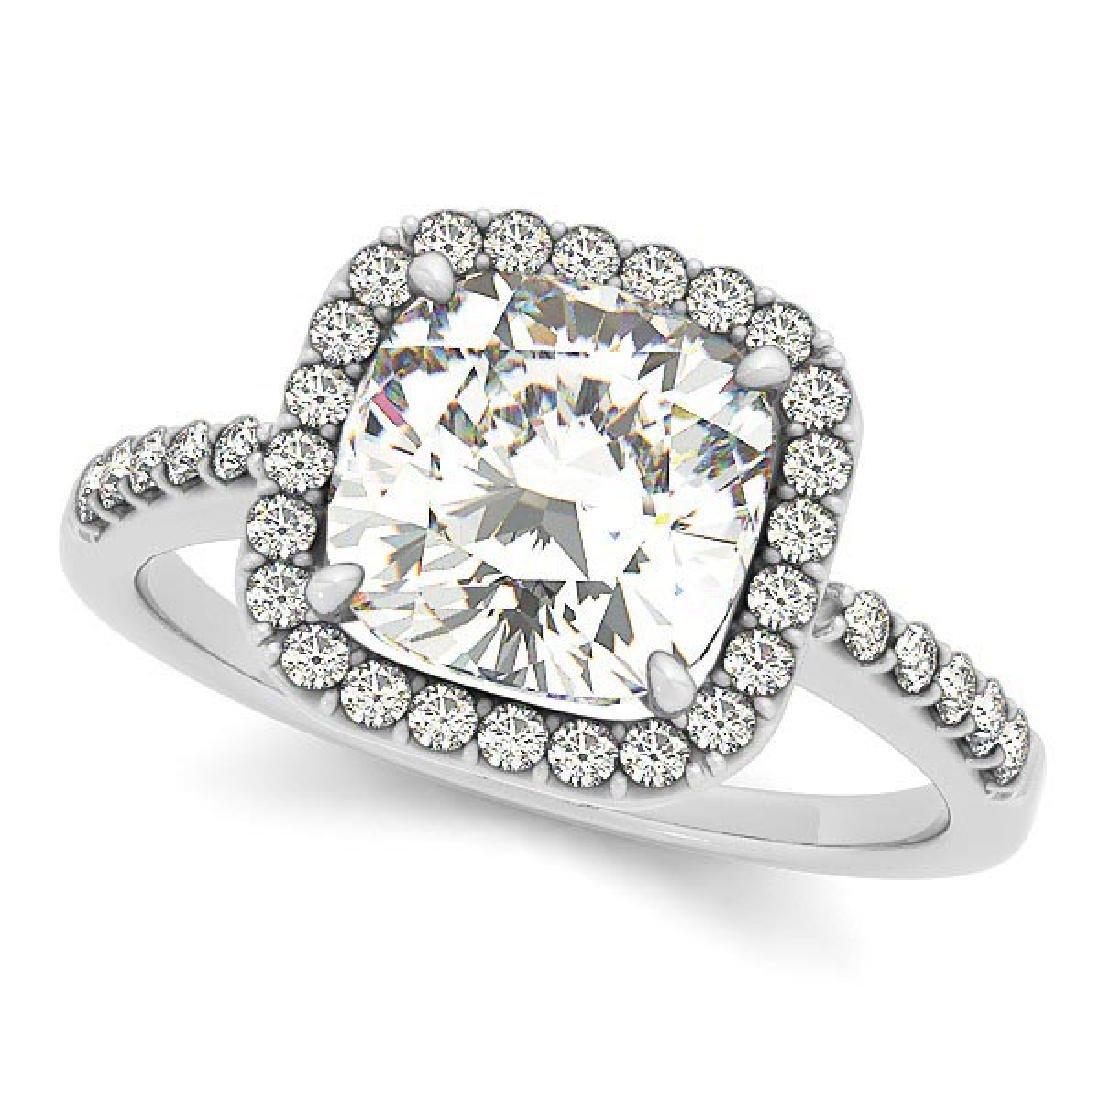 Cushion Cut Diamond Halo Engagement Ring w/ Accents 14k